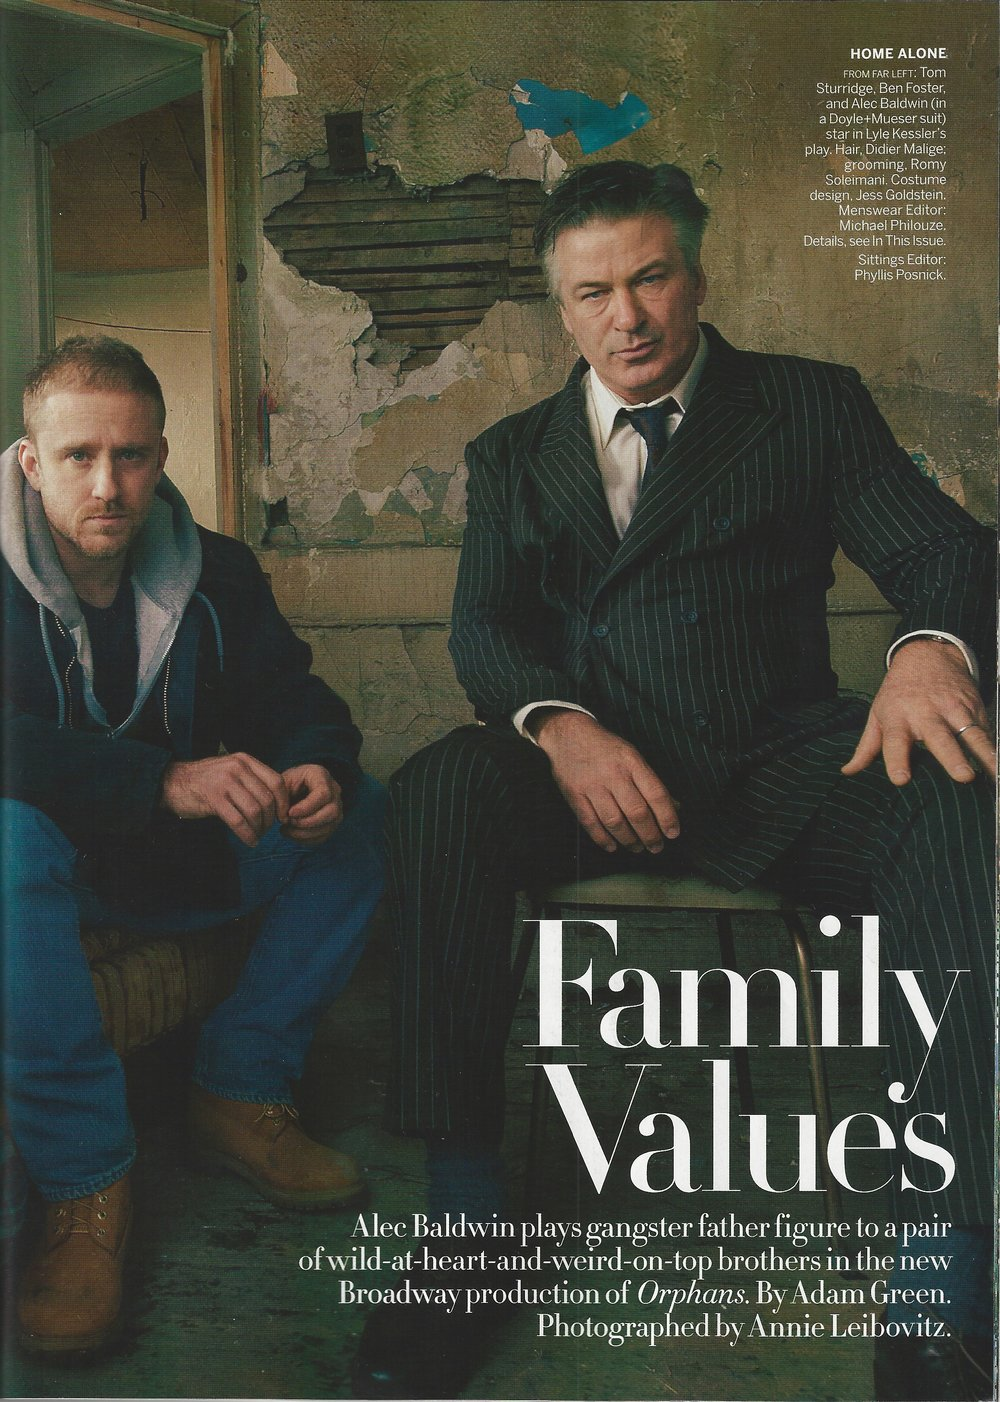 Vogue May 2013 - Alec Baldwin Doyle+Mueser.jpg